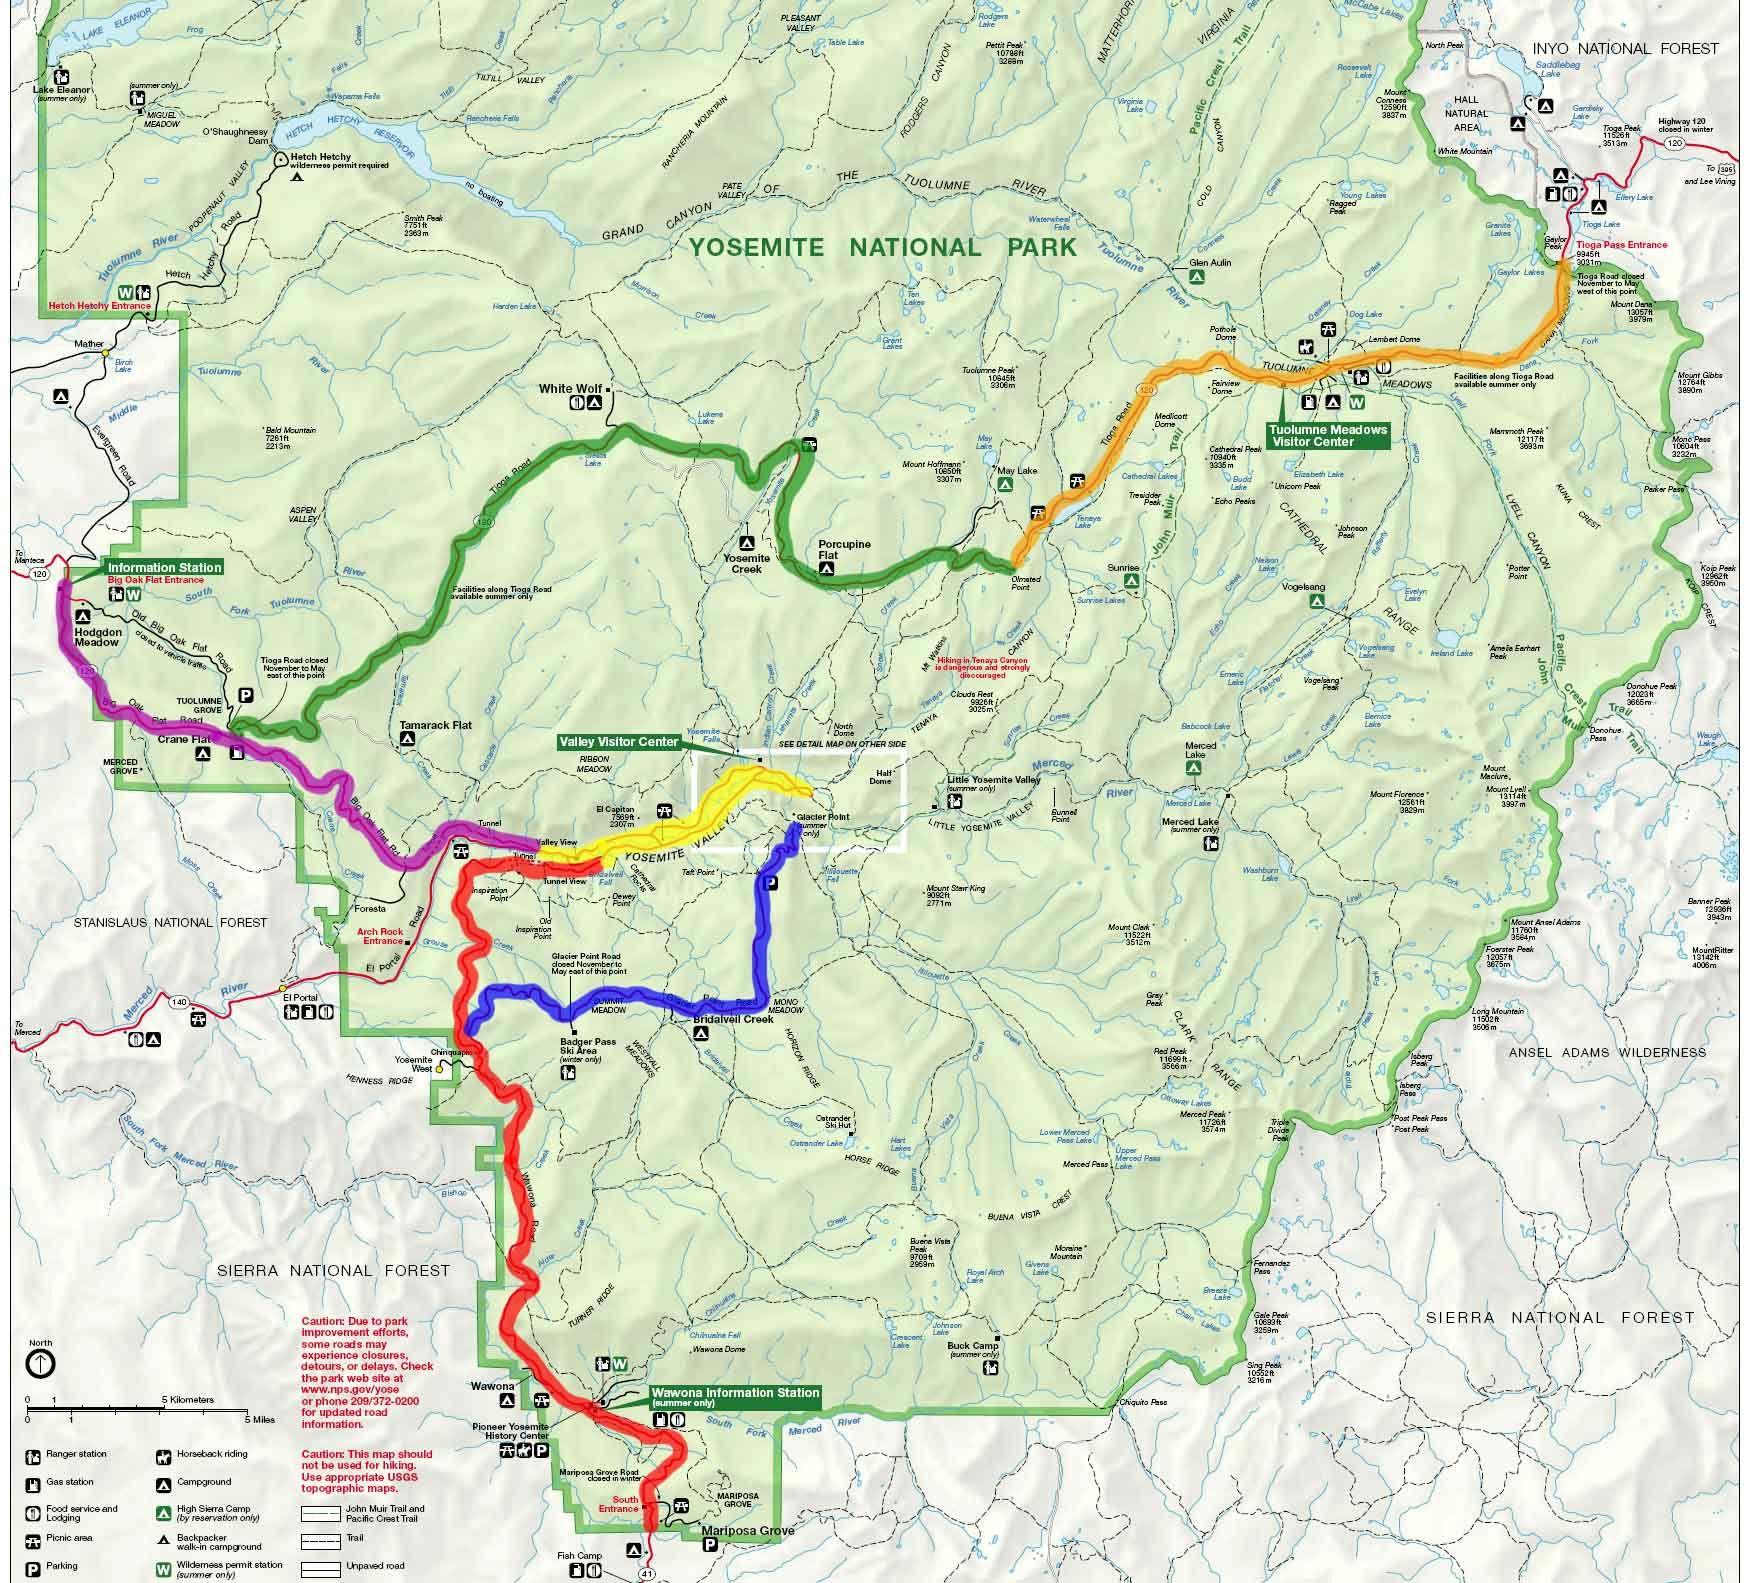 Yosemite National Park Map NationalparkedcomUS - Yosemite national park on us map